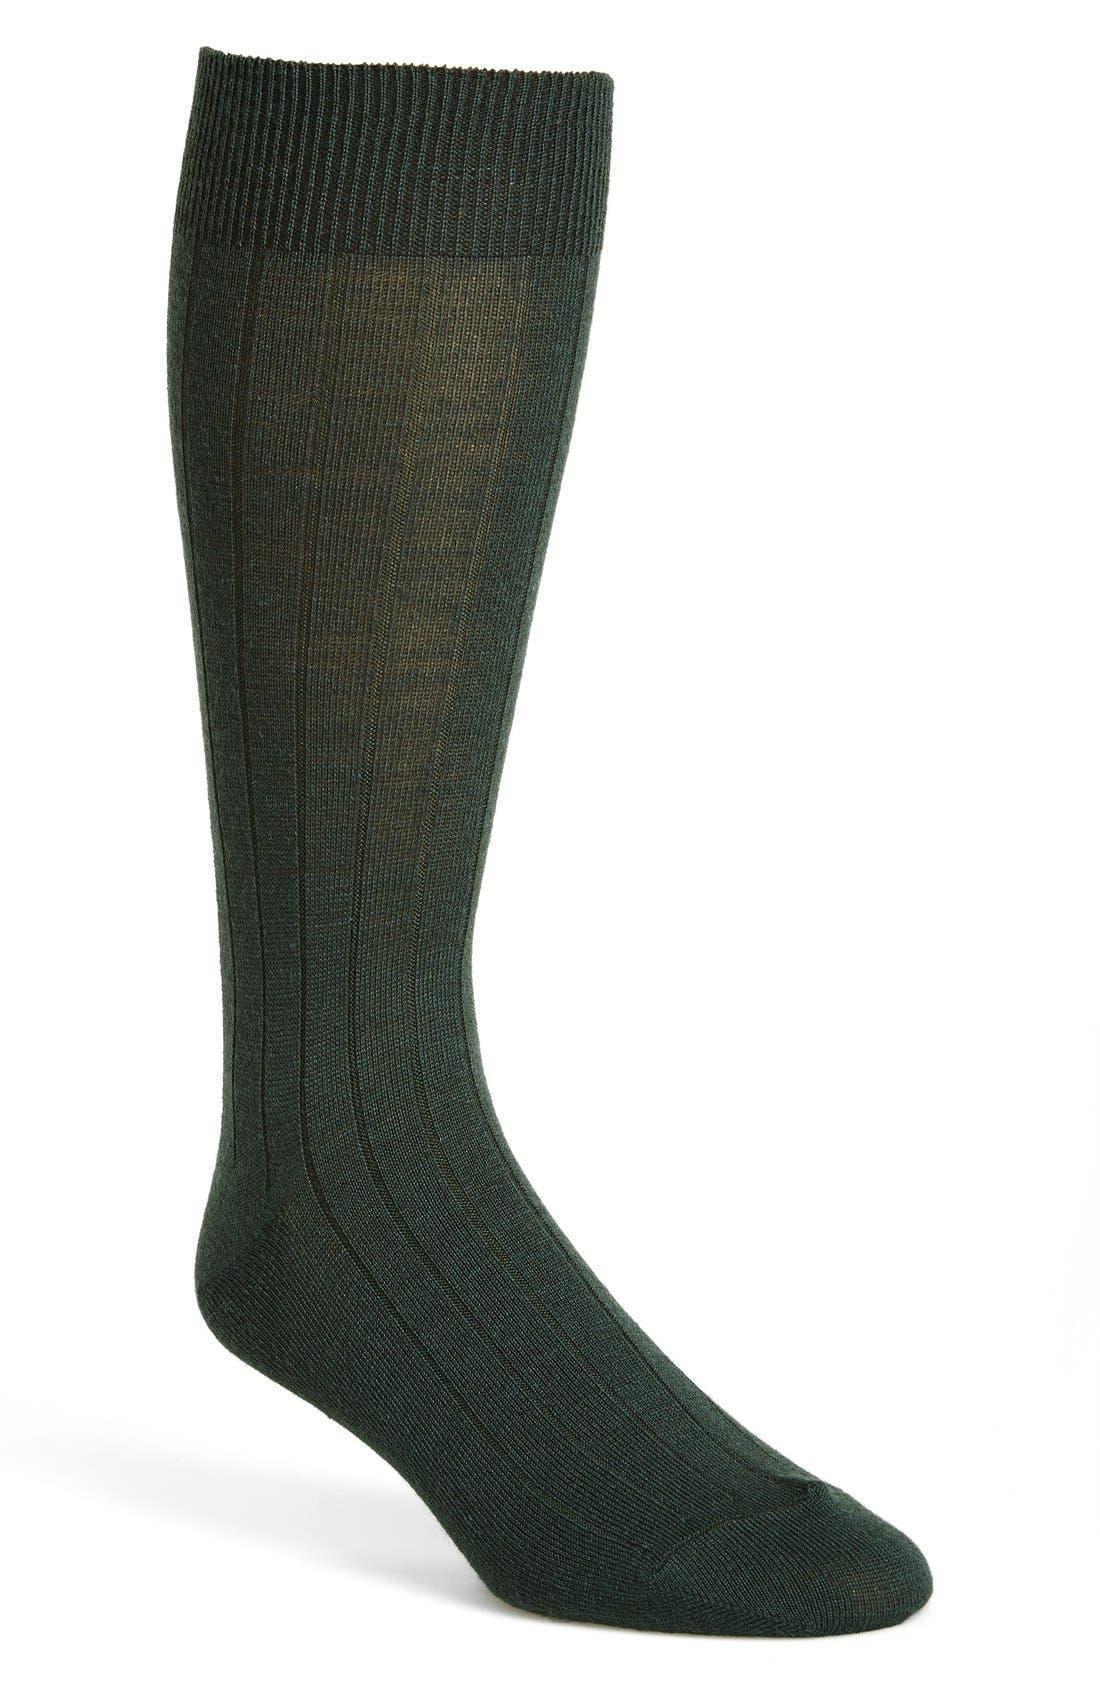 Main Image - Cole Haan Solid Wool Blend Rib Socks (Men)